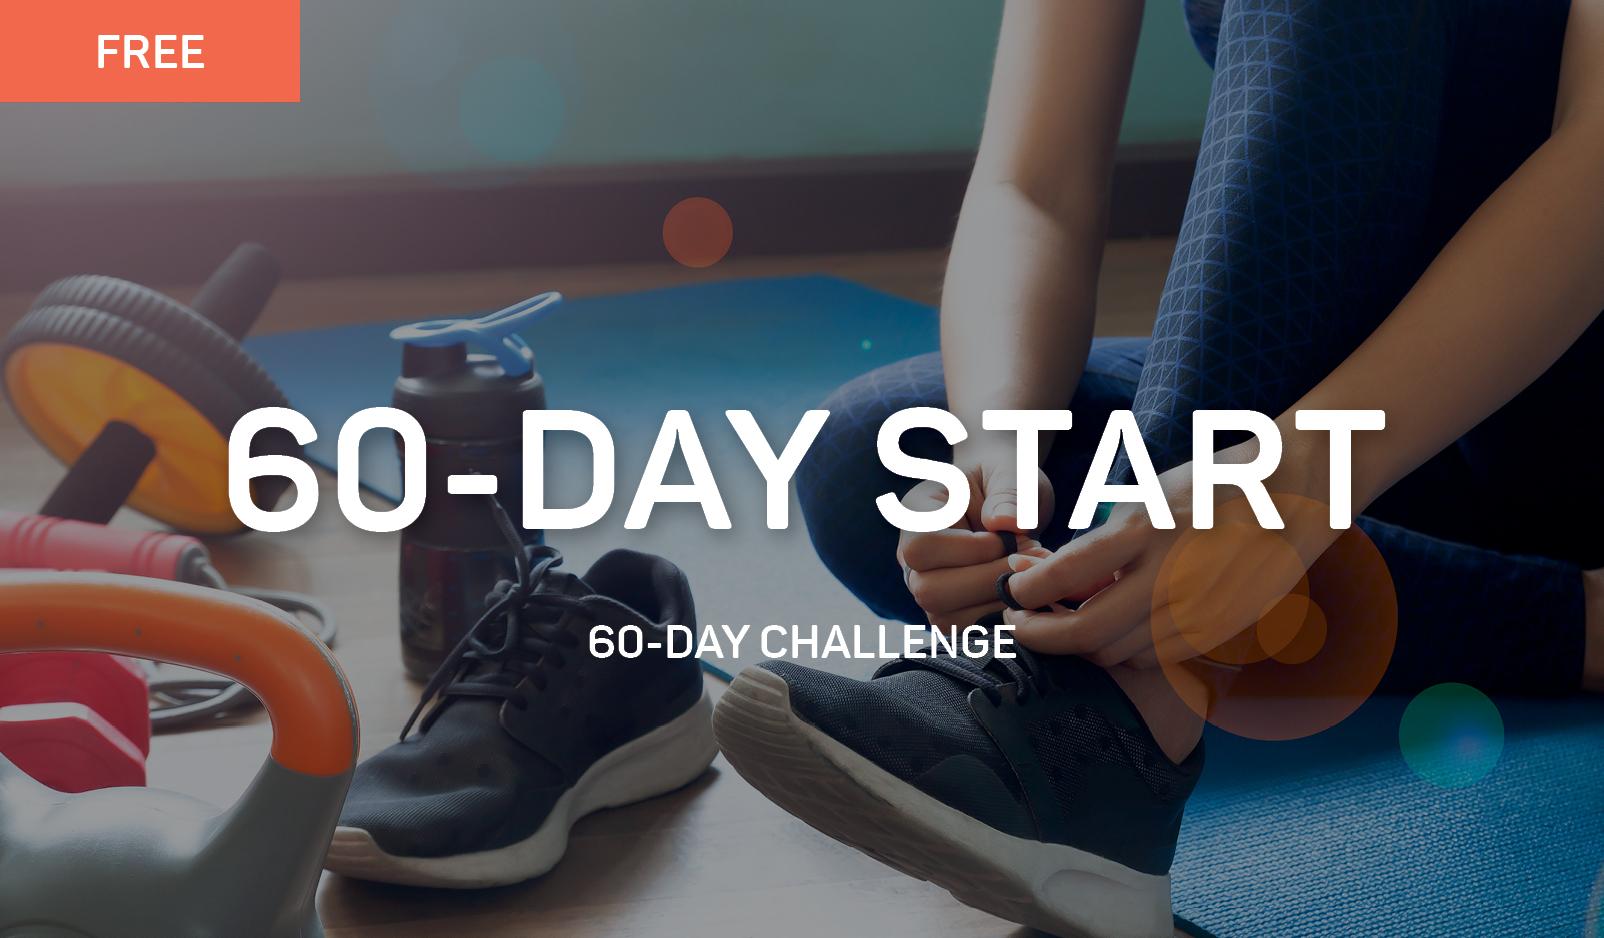 60-Day Start Fitness Challenge